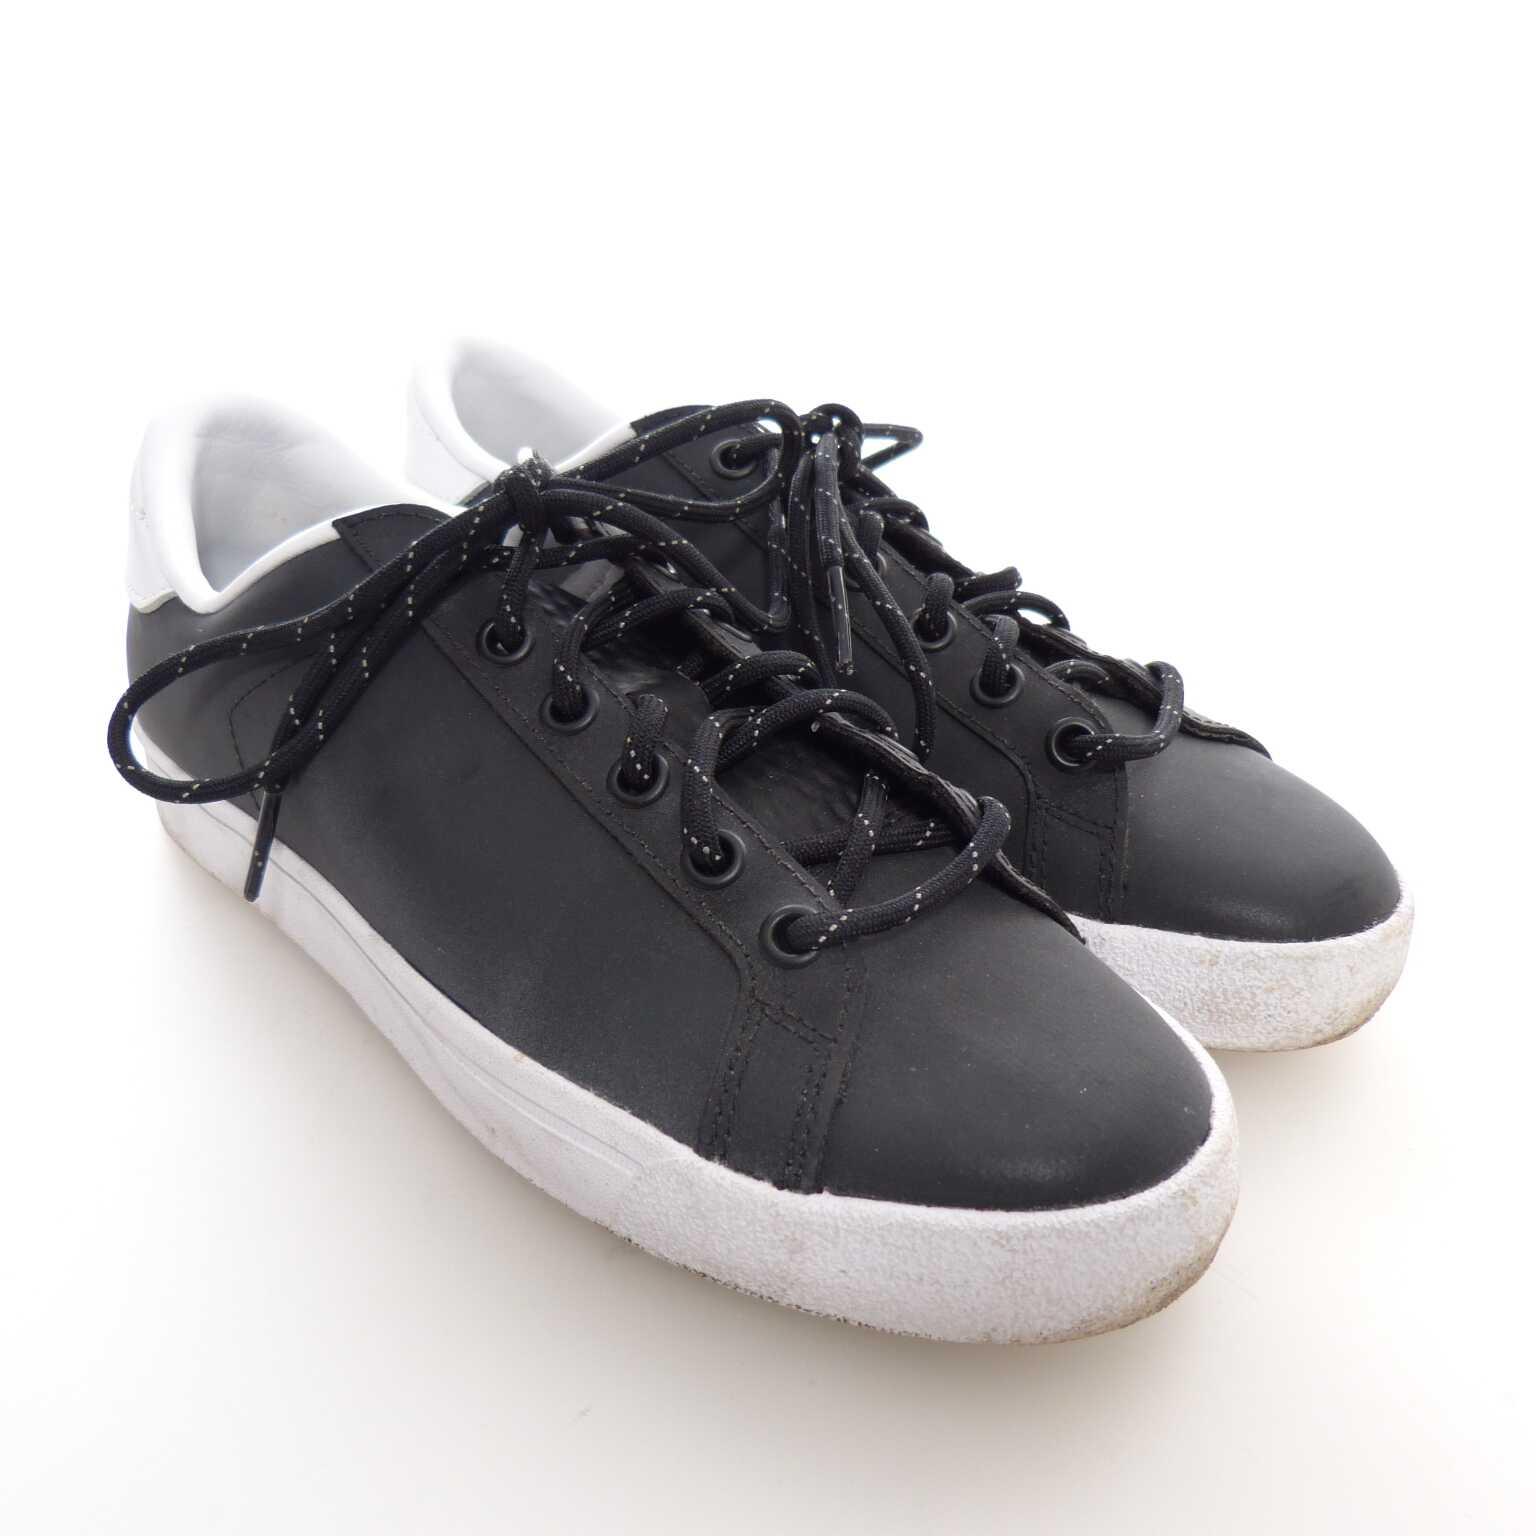 brand new c64e0 cd04f Adidas Sneaker Schnür Schuhe Gr. 38 Schwarz Weiß (AHB)